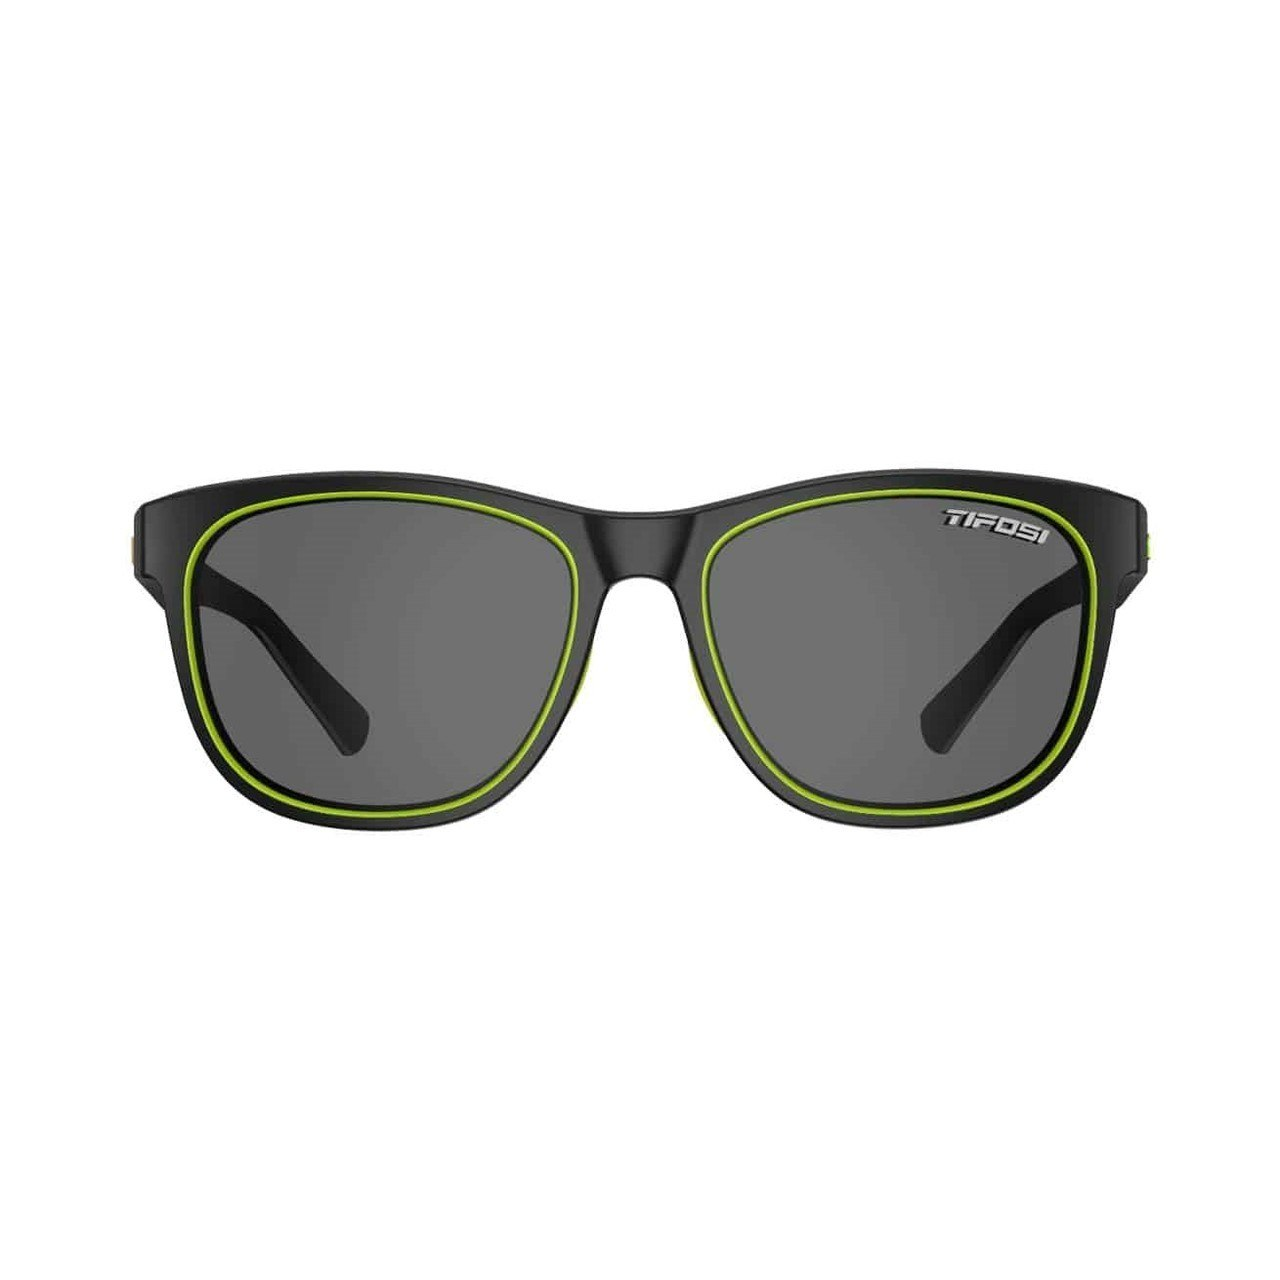 Tifosi Swank Sunglasses Satin Black//Neon-New in Box